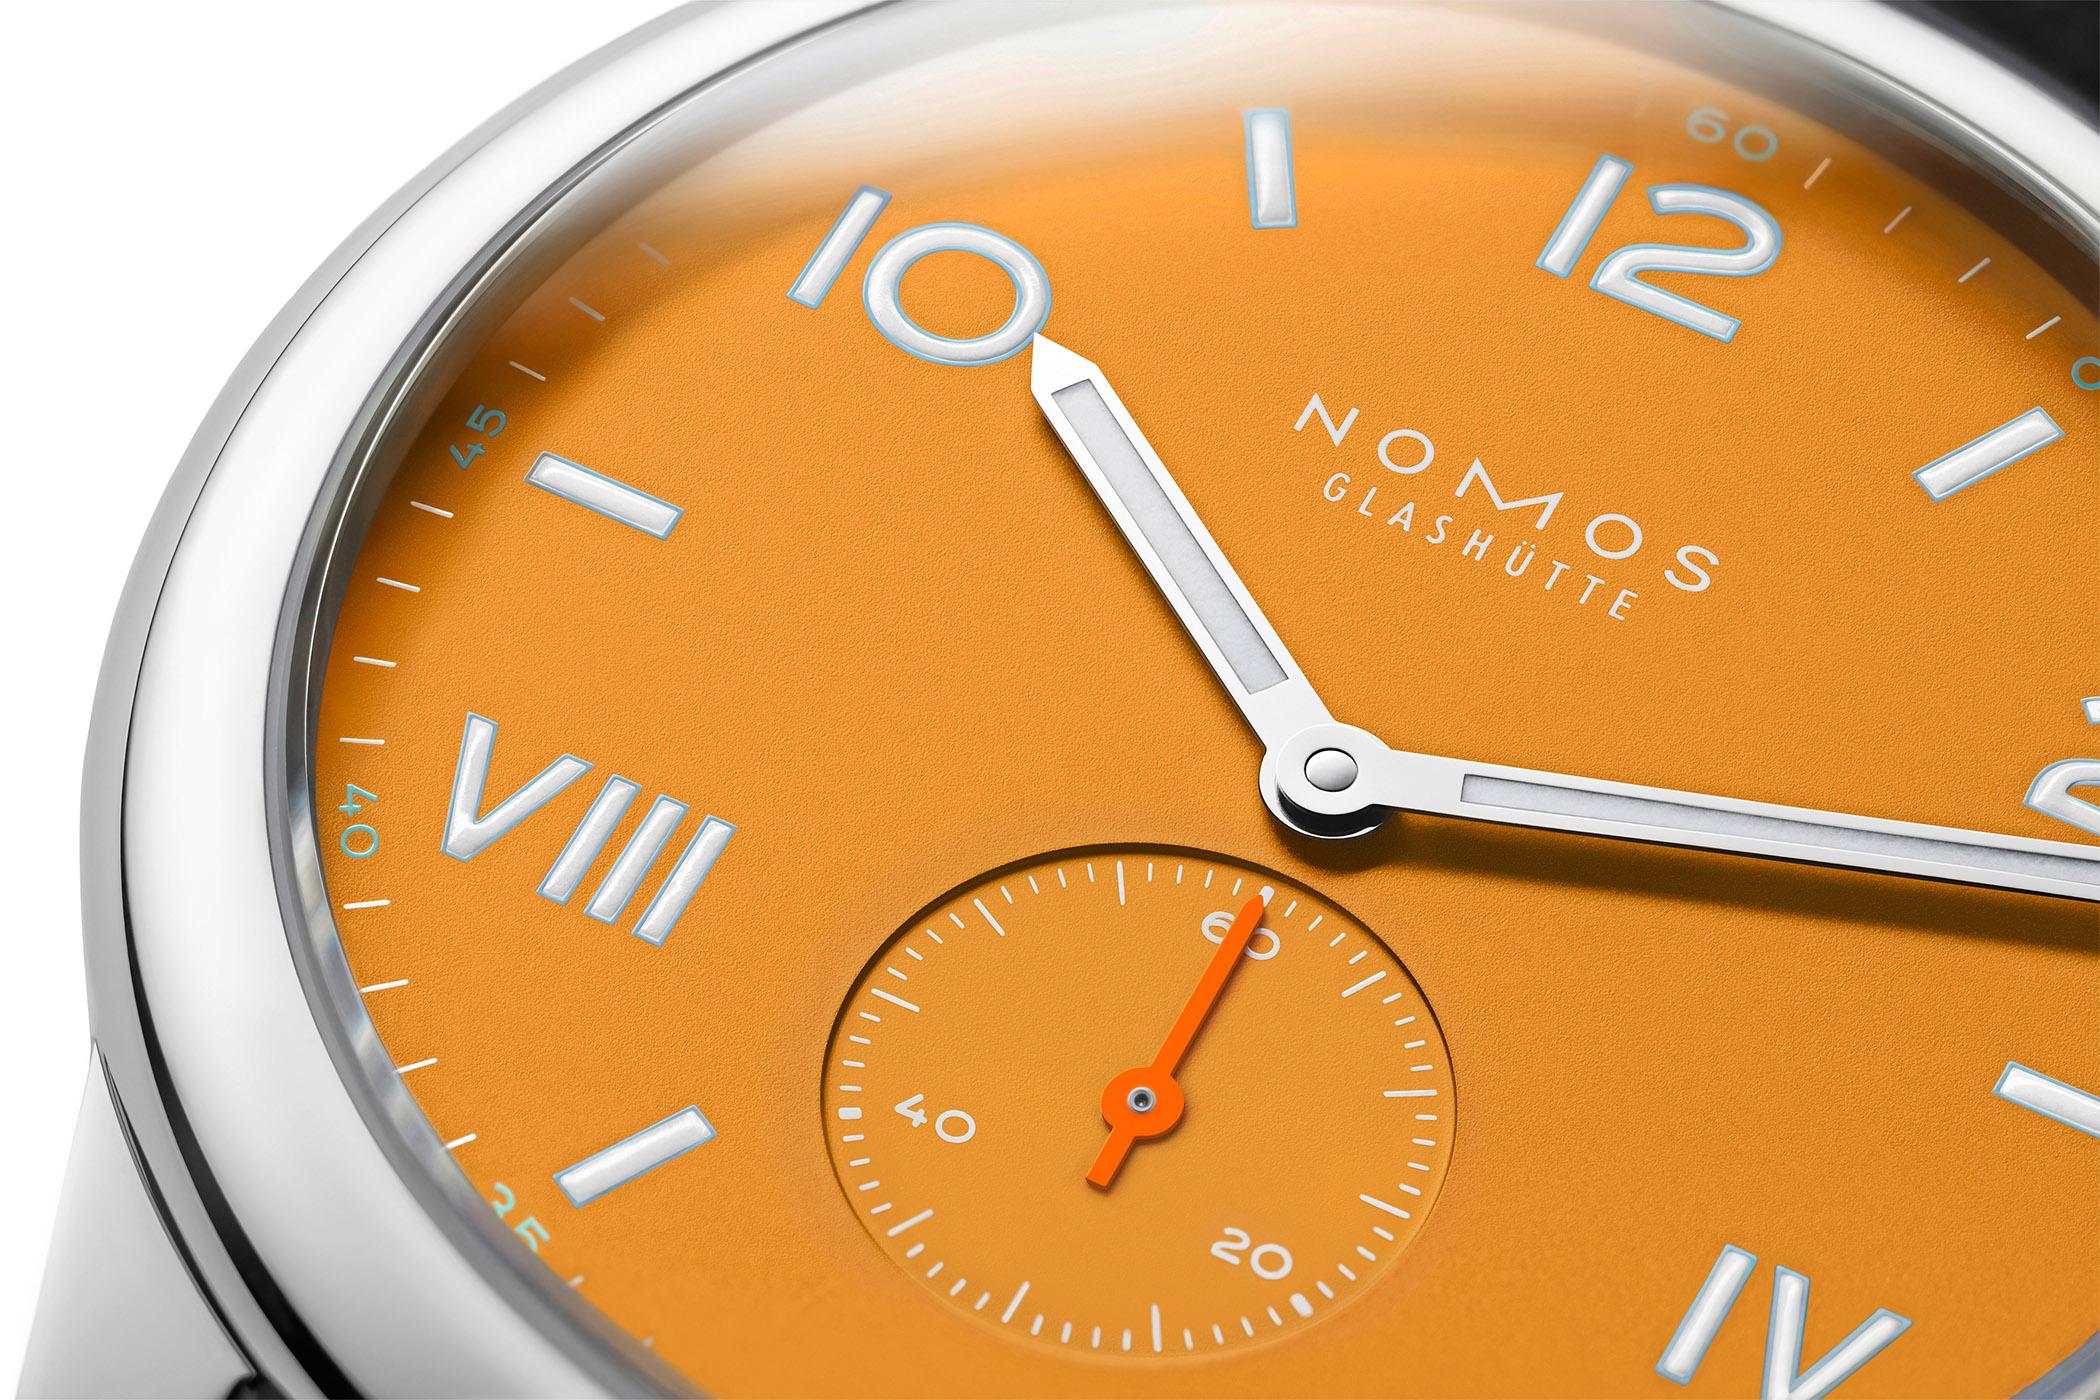 Nomos Club Campus Absolute Gray and Future Orange 2021 editions